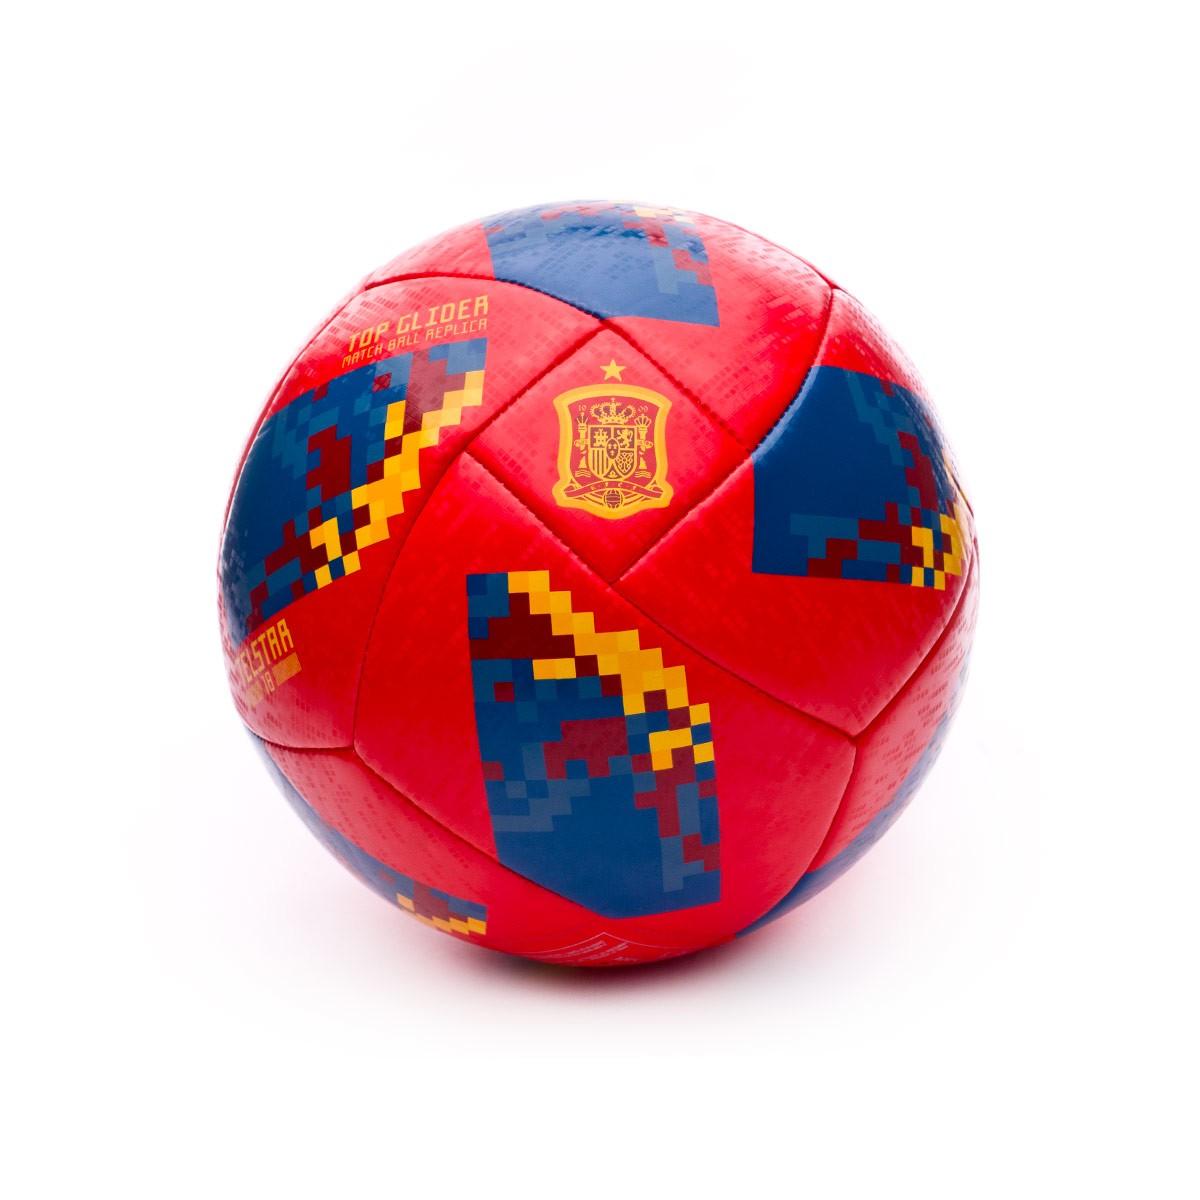 f4df7ccf5 Pallone adidas World Cup 18 Spagna Telstar 2017-2018 Red-Gold - Negozio di  calcio Fútbol Emotion